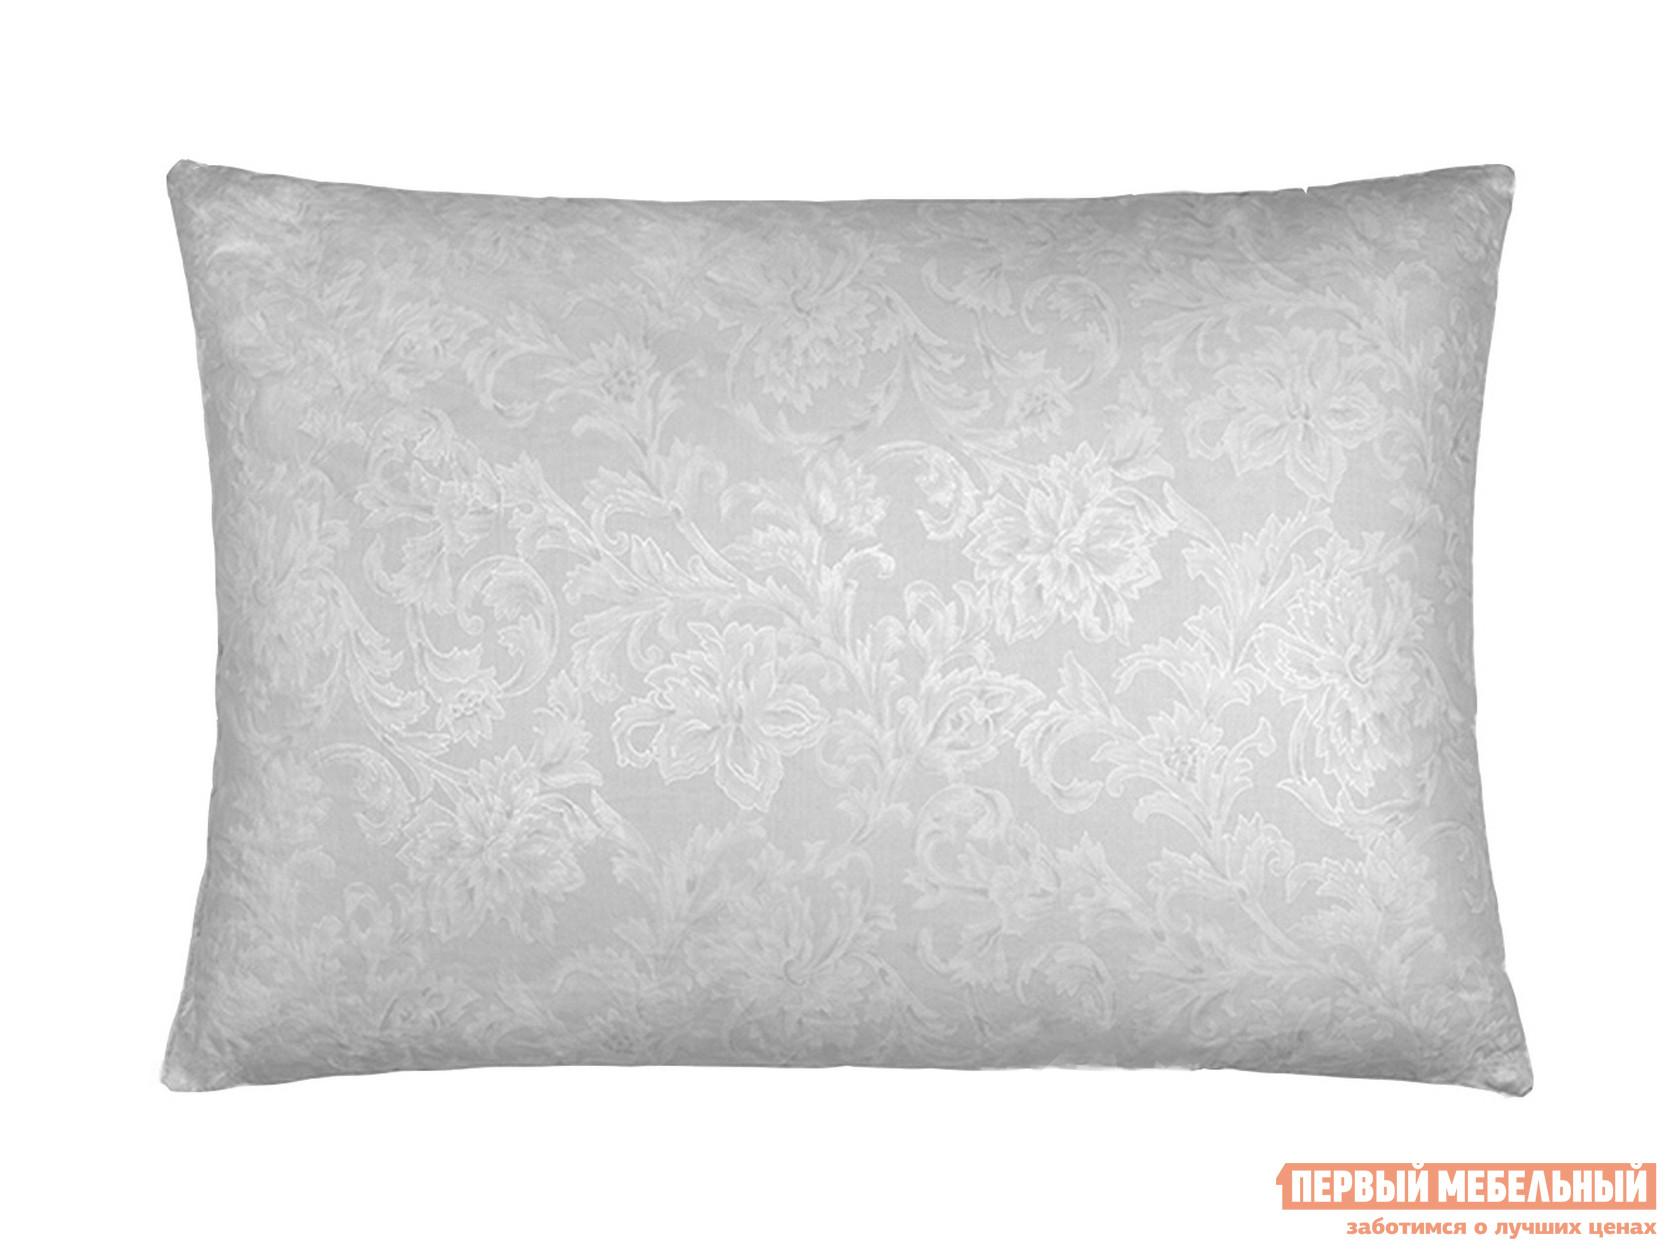 Подушка Подушка Рокко Голубой, 70х50 фото